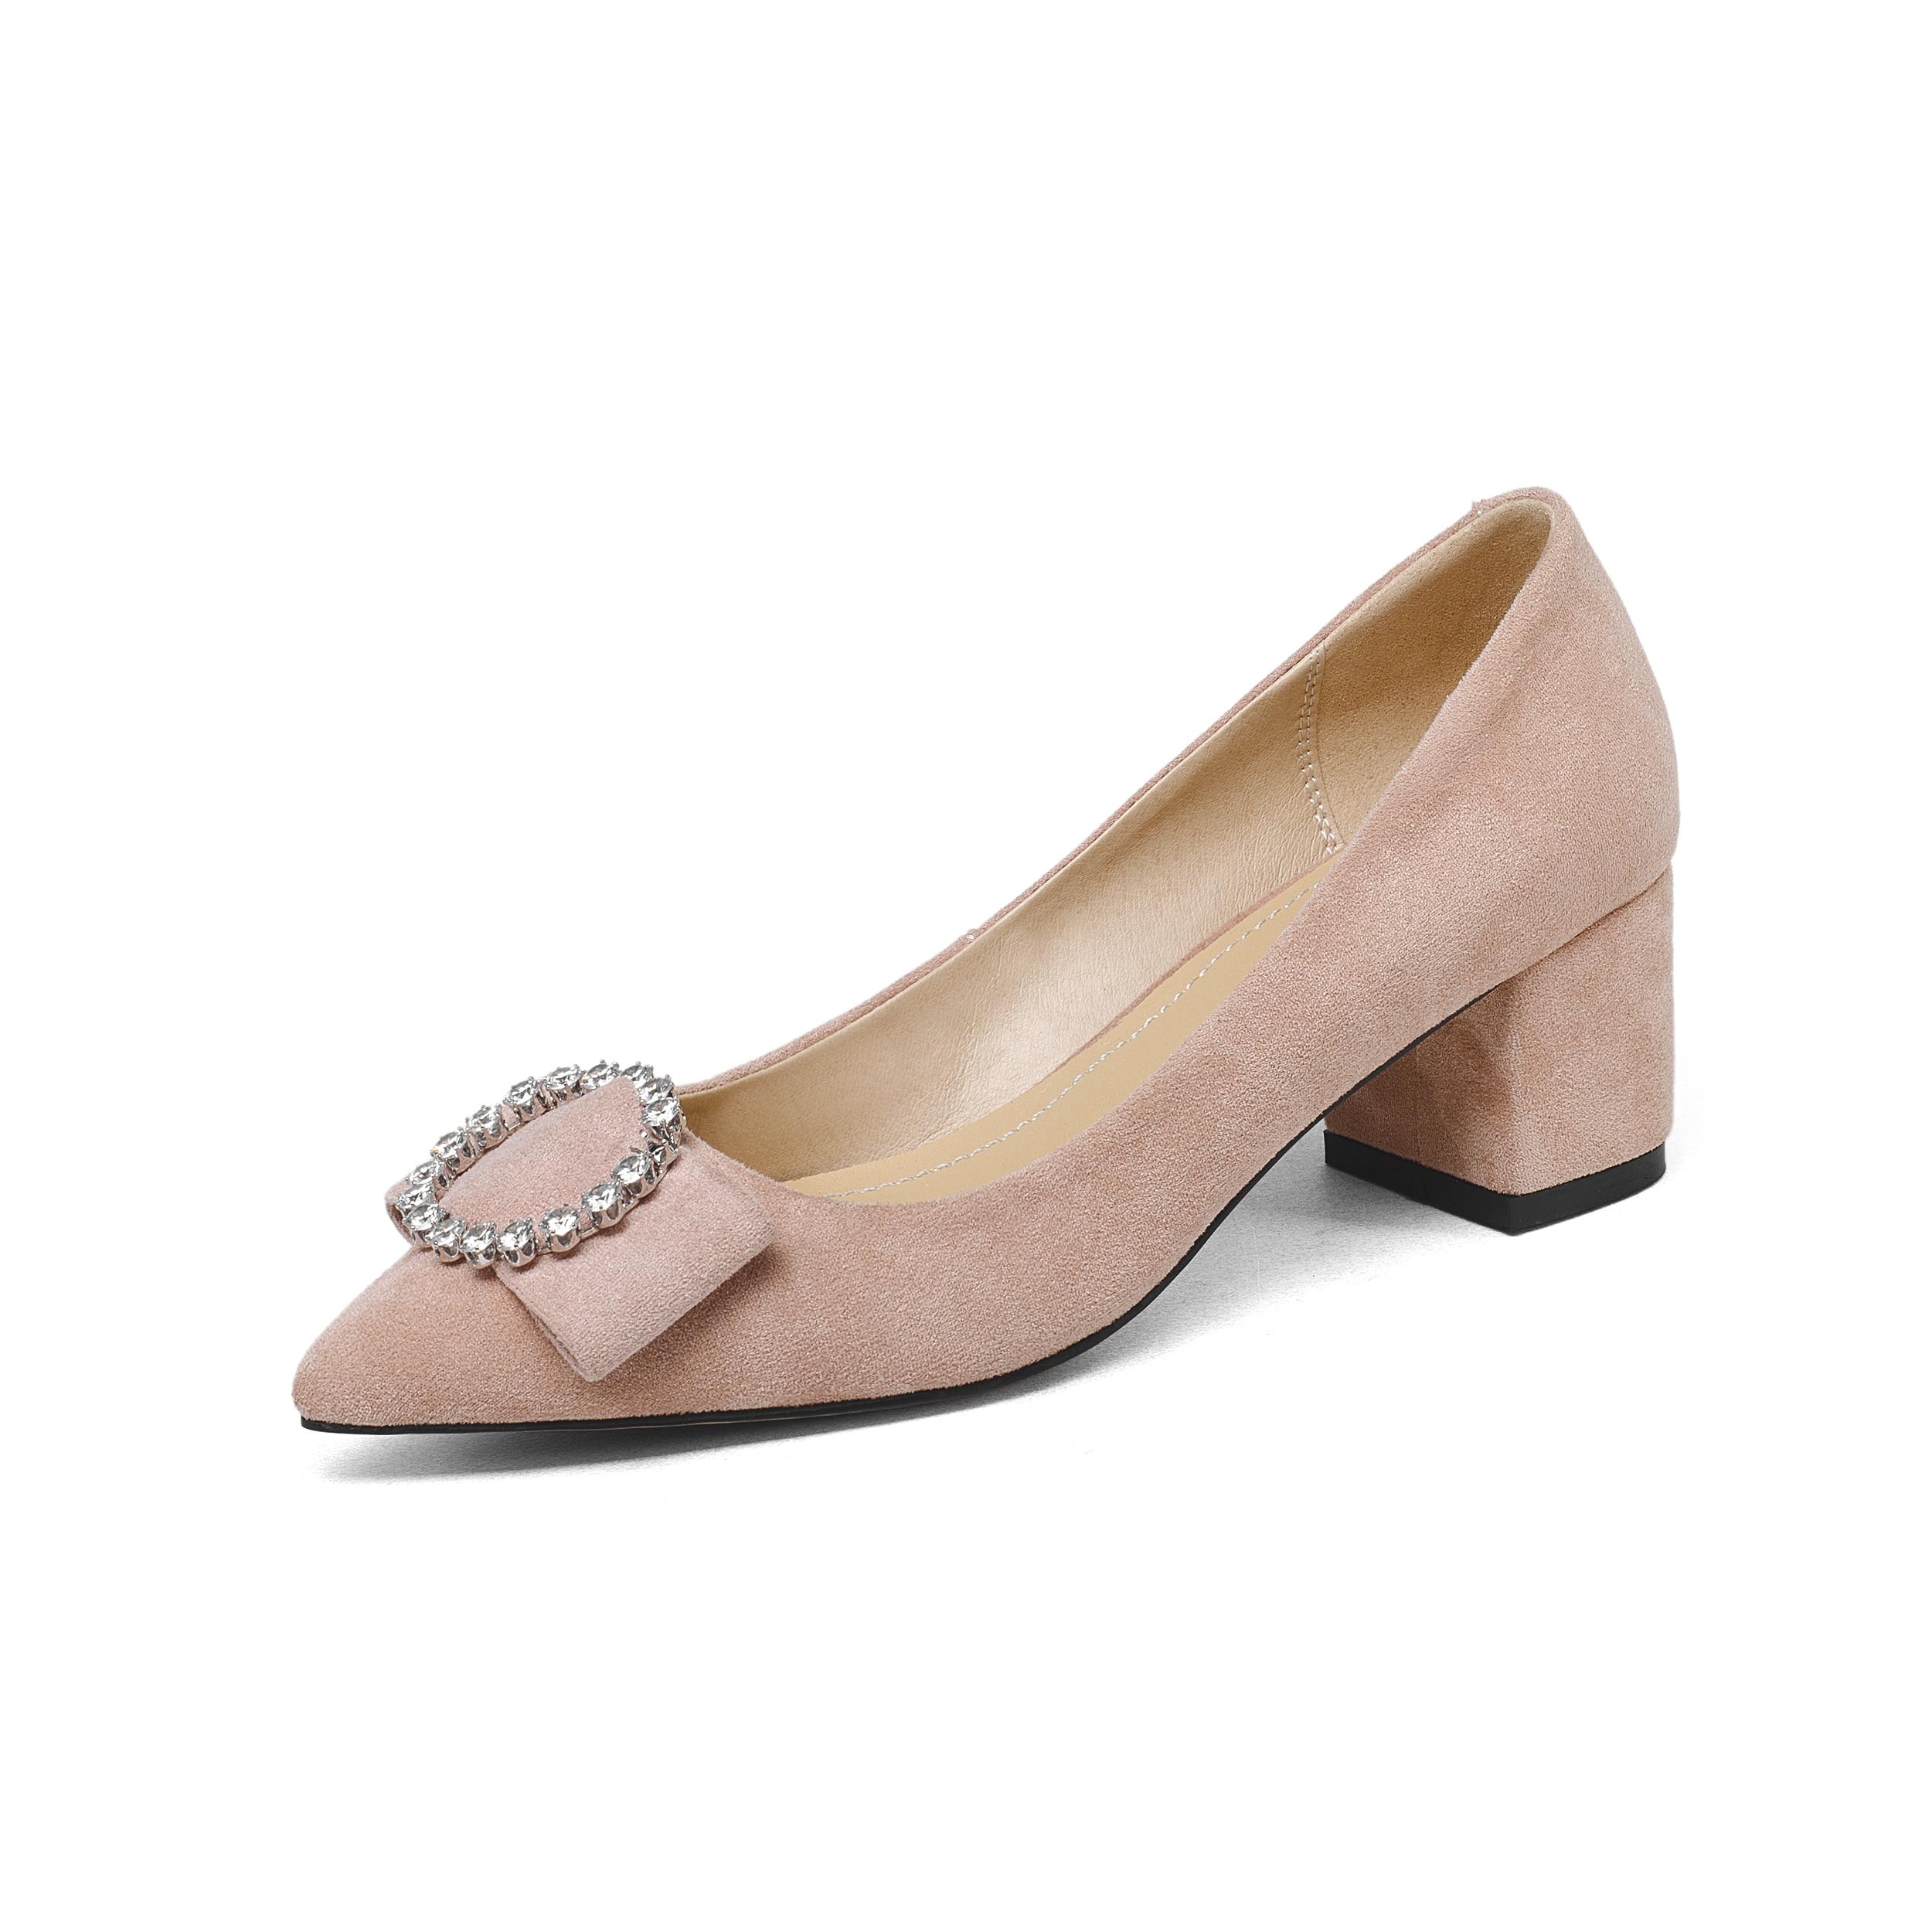 Bombas Zapatos Microfibra Mujer Tacones Mujeres Oficina Altos Tamaño Punta Vestido Dedo Moda Damas Nemaone 2018 tgnqxwHzgU